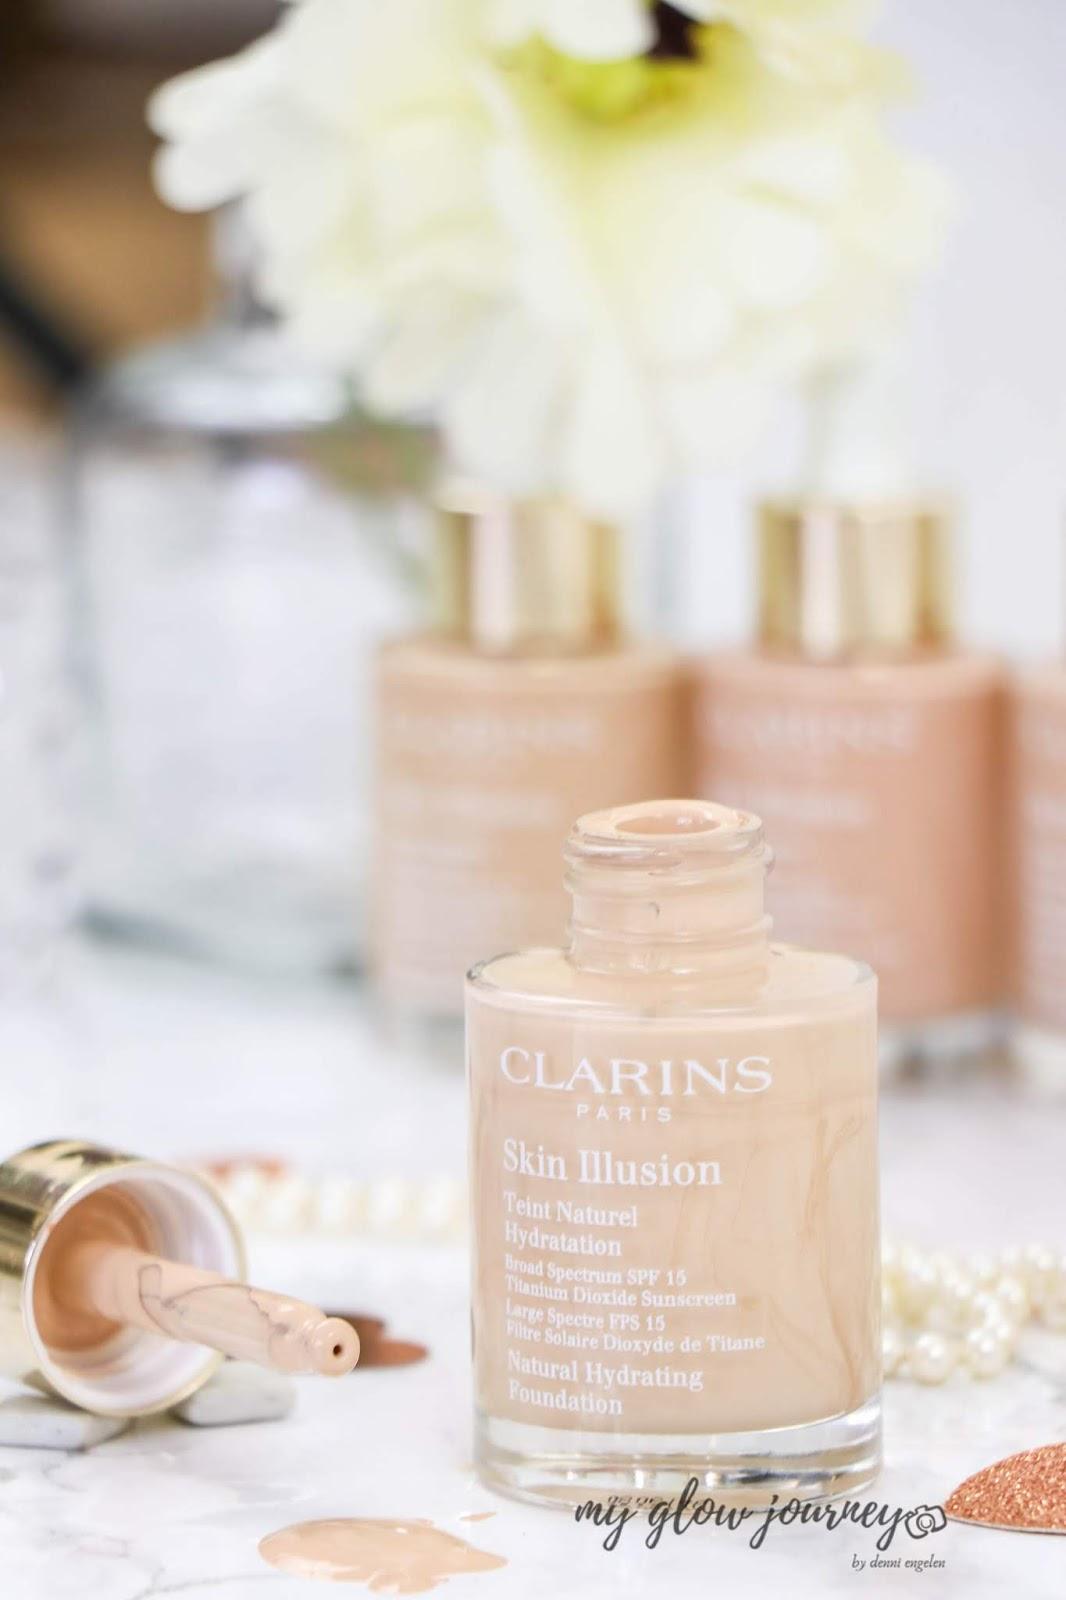 Clarins Skin Illusion Spf 15